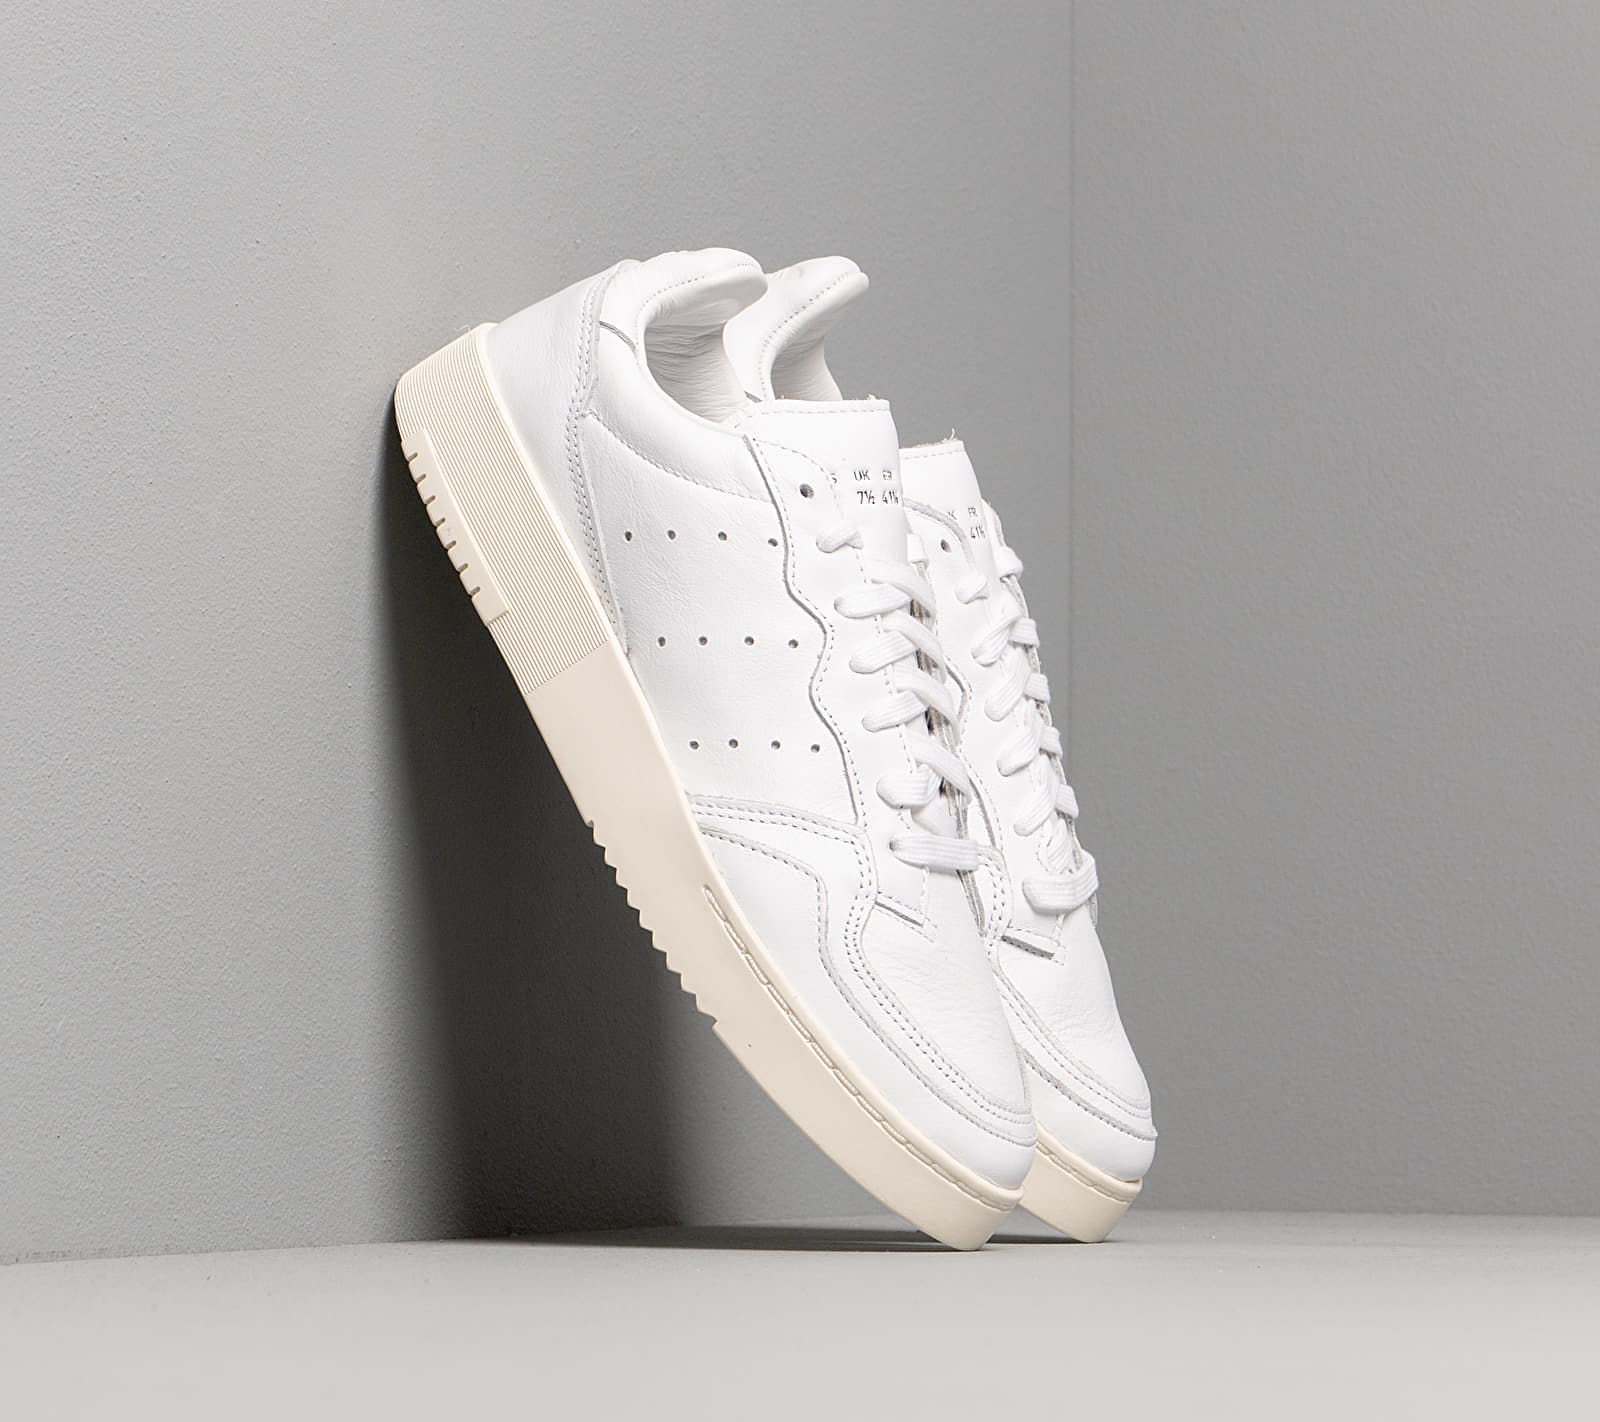 adidas Supercourt Crystal White/ Core White/ Off White EE6325